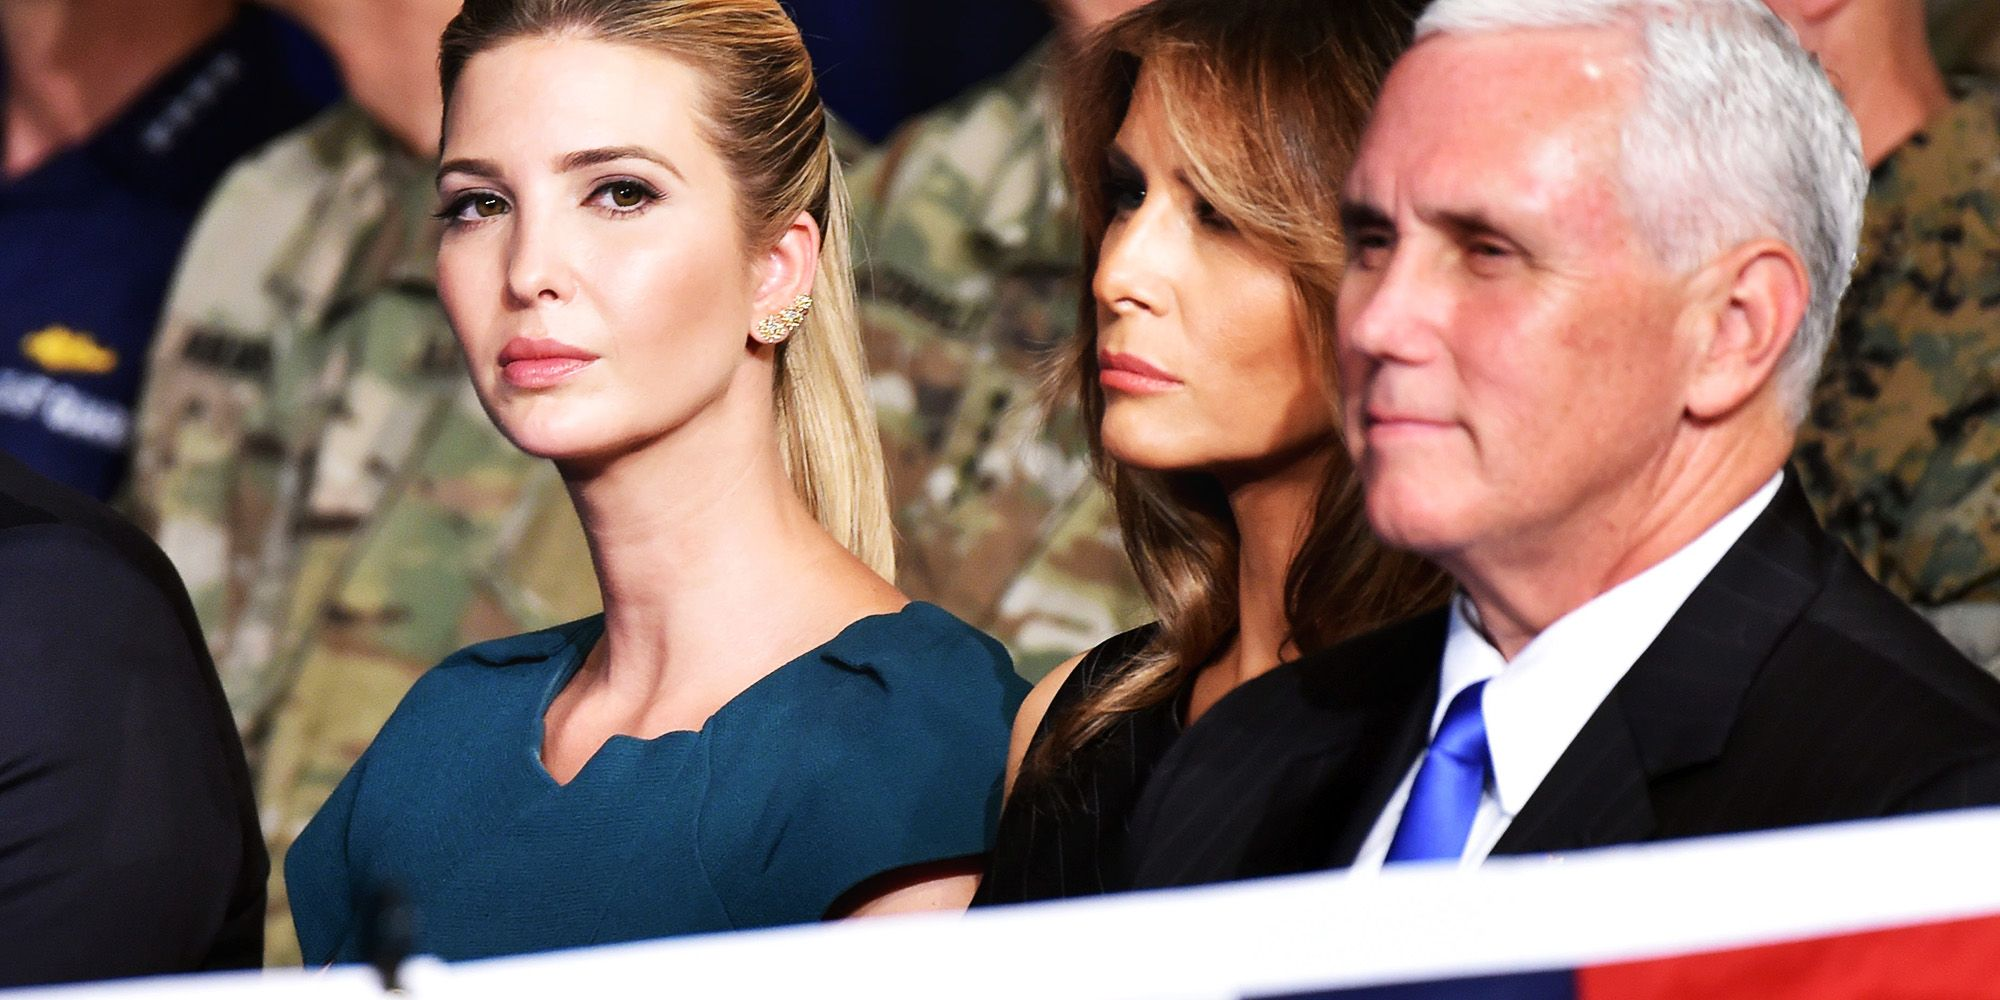 Ivanka Trump Just Endorsed Ending Obama's Equal Pay Initiative